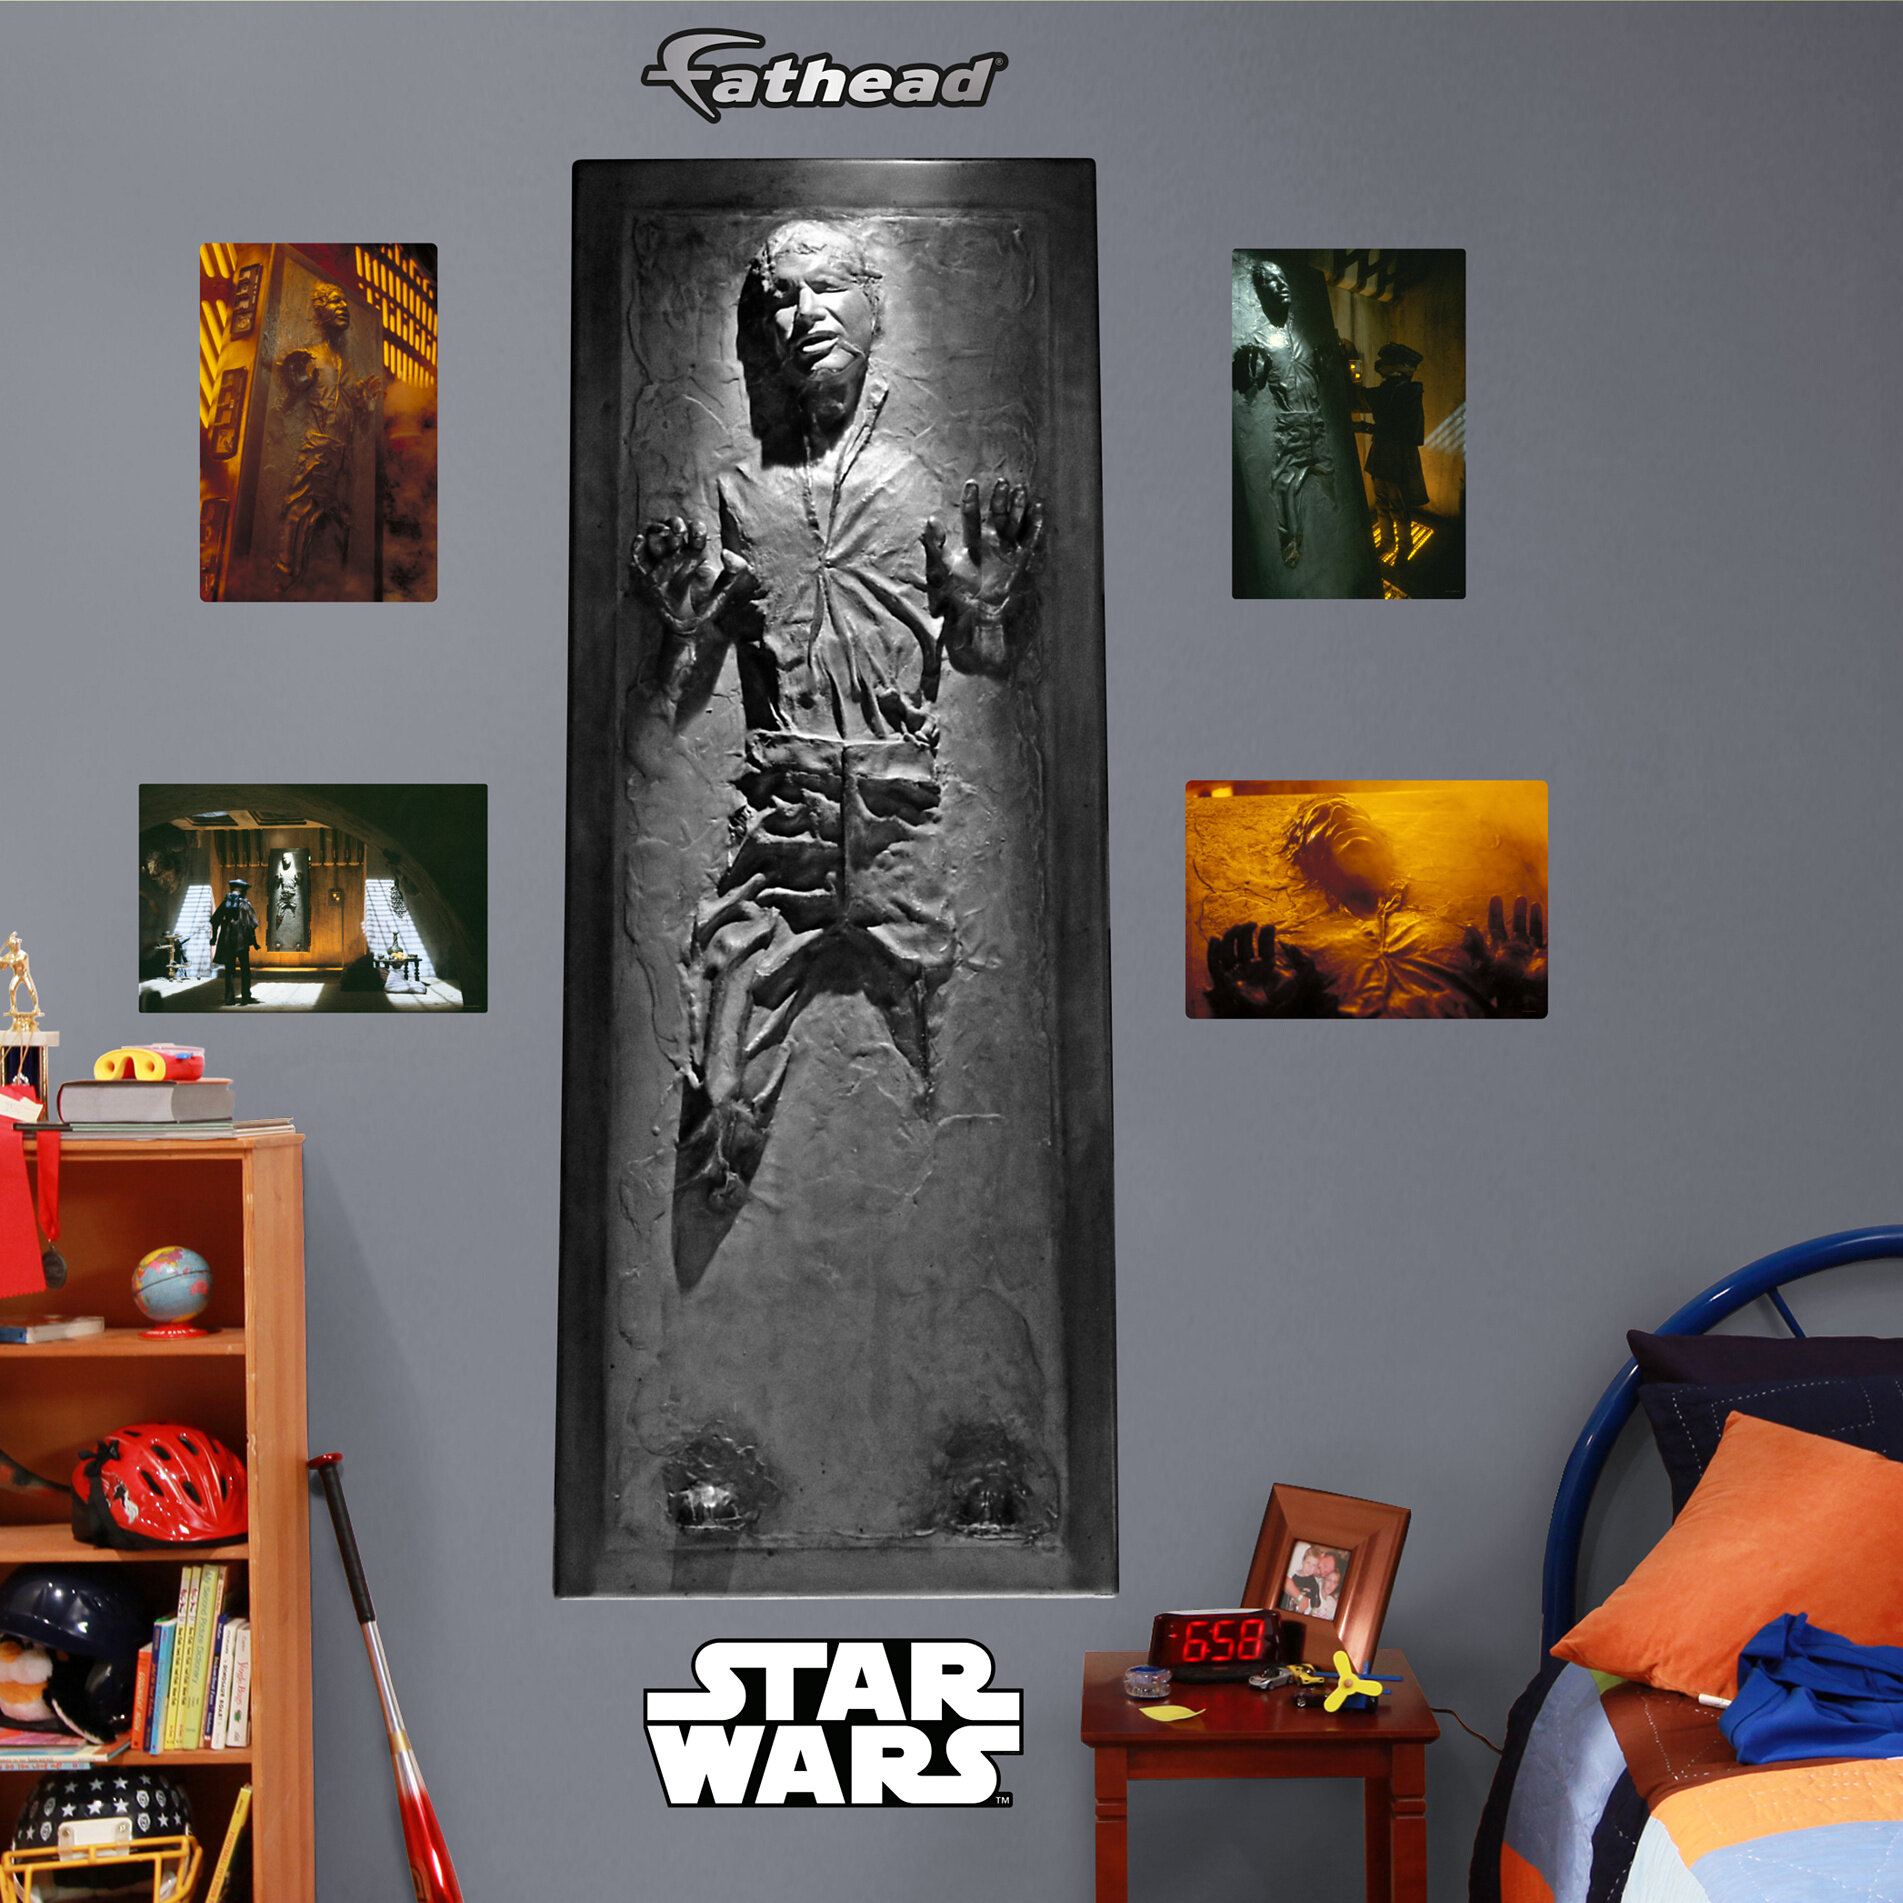 Fathead Lucas Star Wars Han Solo In Carbonite Wall Decal Reviews Wayfair